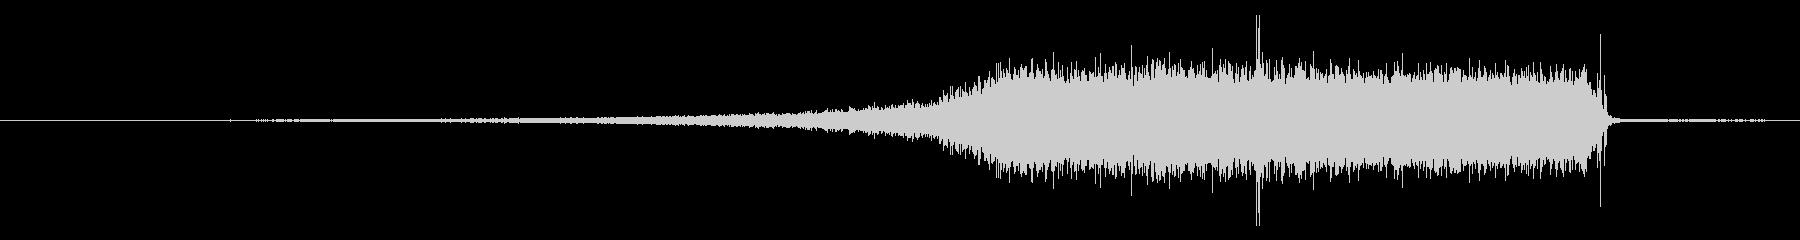 EXT:プルオンヘッドオン、スロー...の未再生の波形